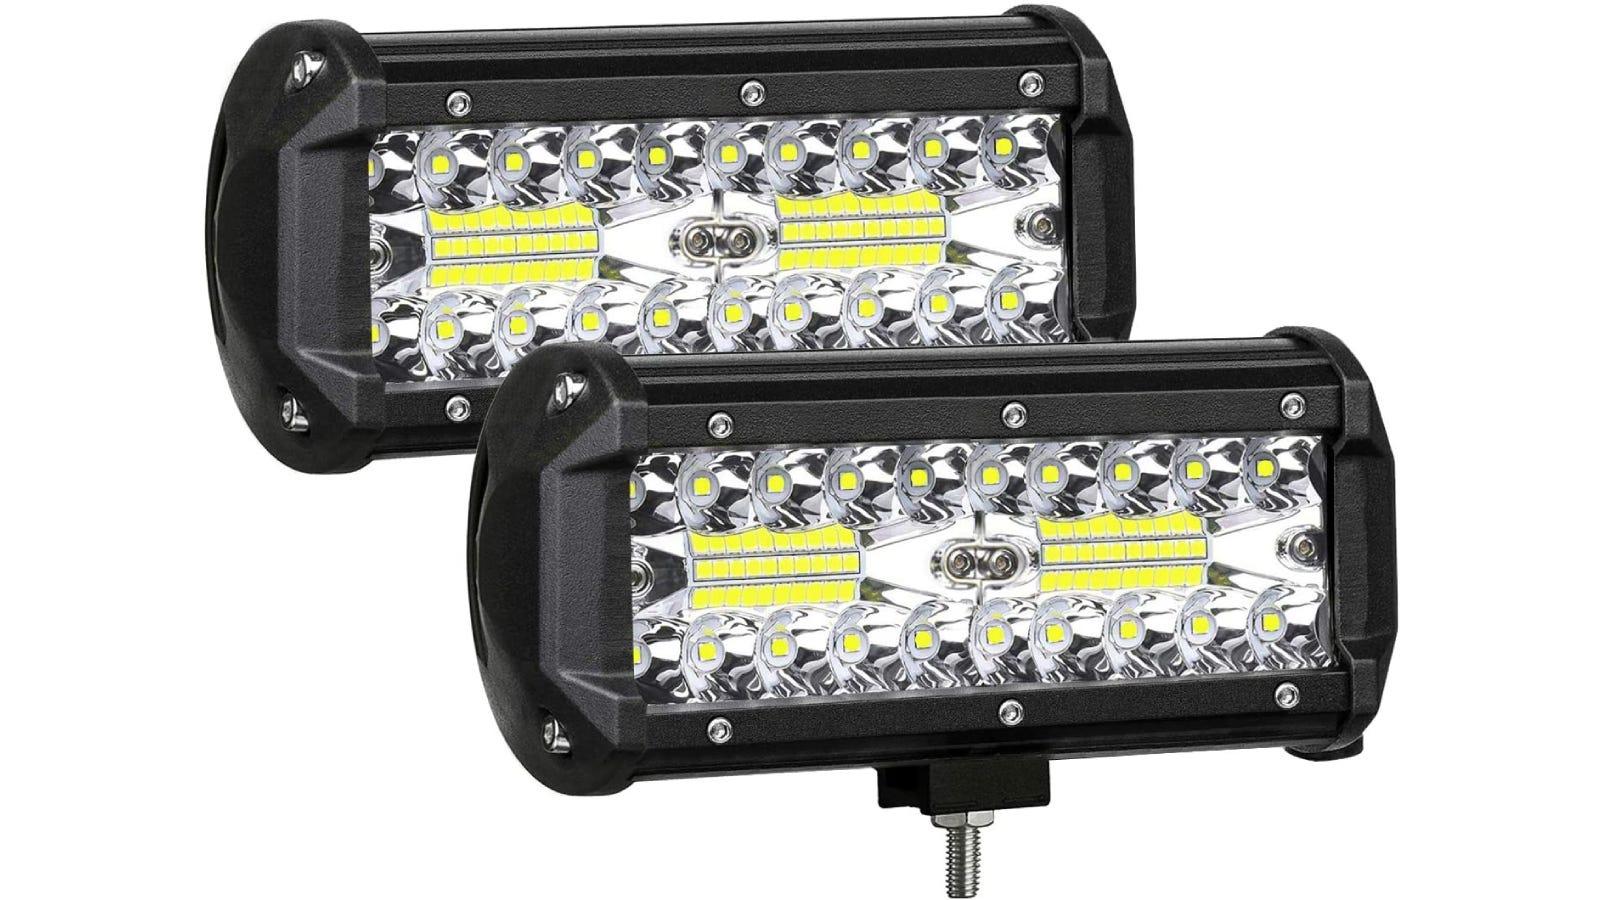 Two rectangular boat lights.